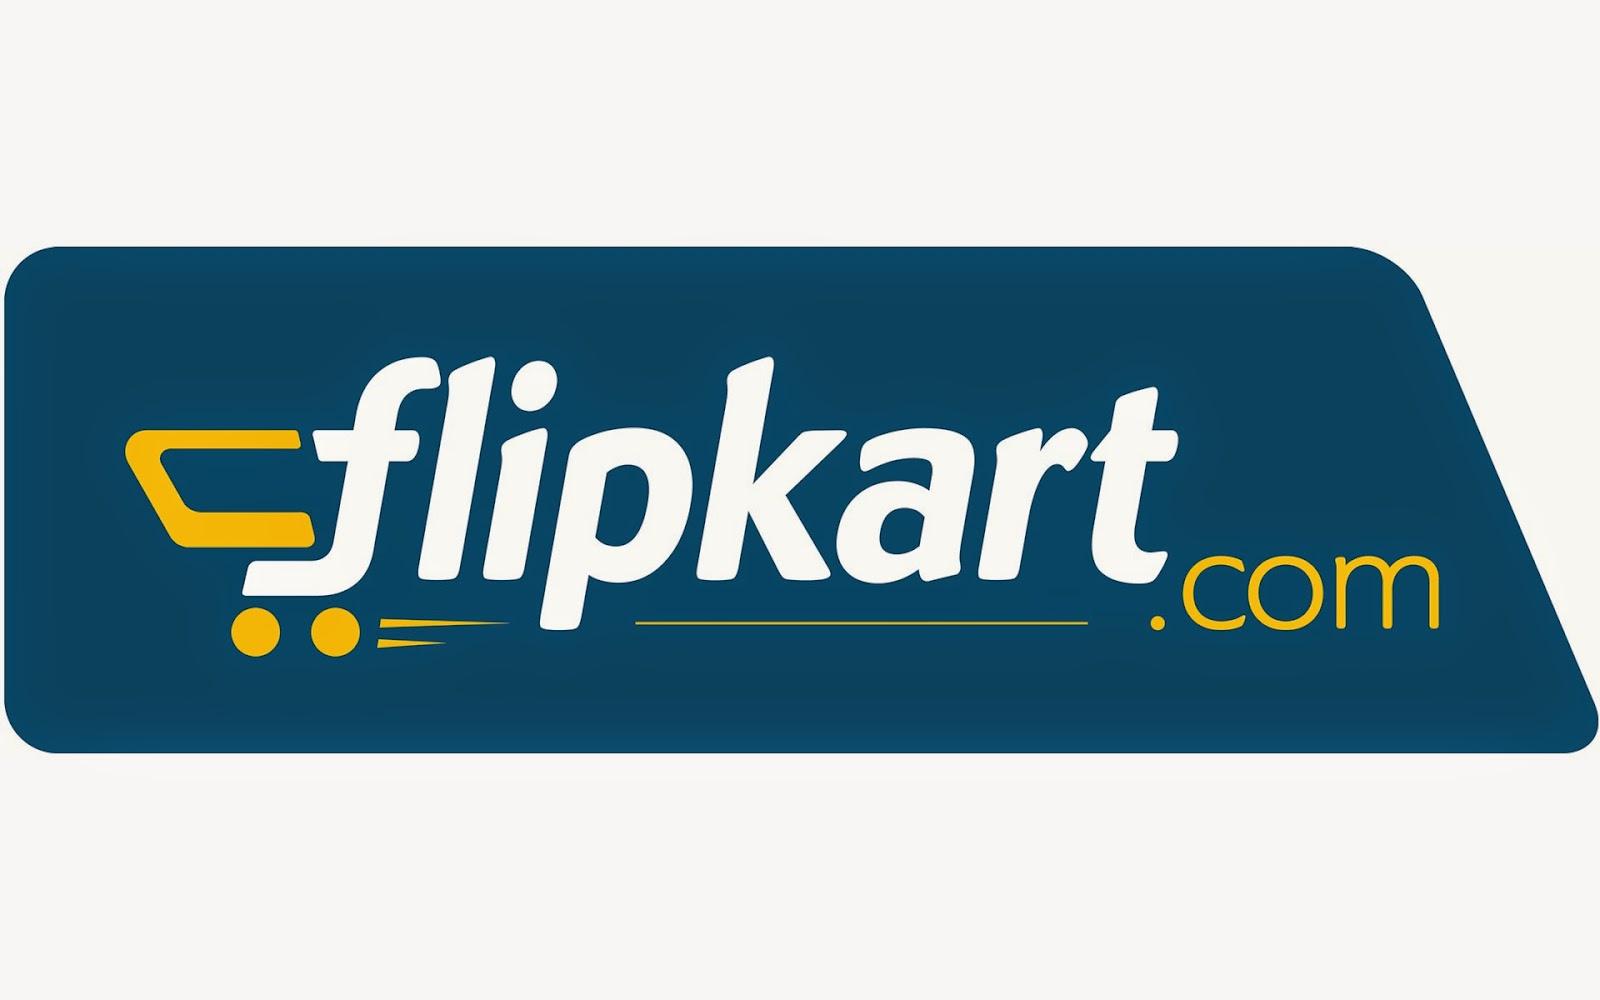 http://www.flipkart.com/books?otracker=nmenu_sub_books-media_0_Books&affid=kheteshwa